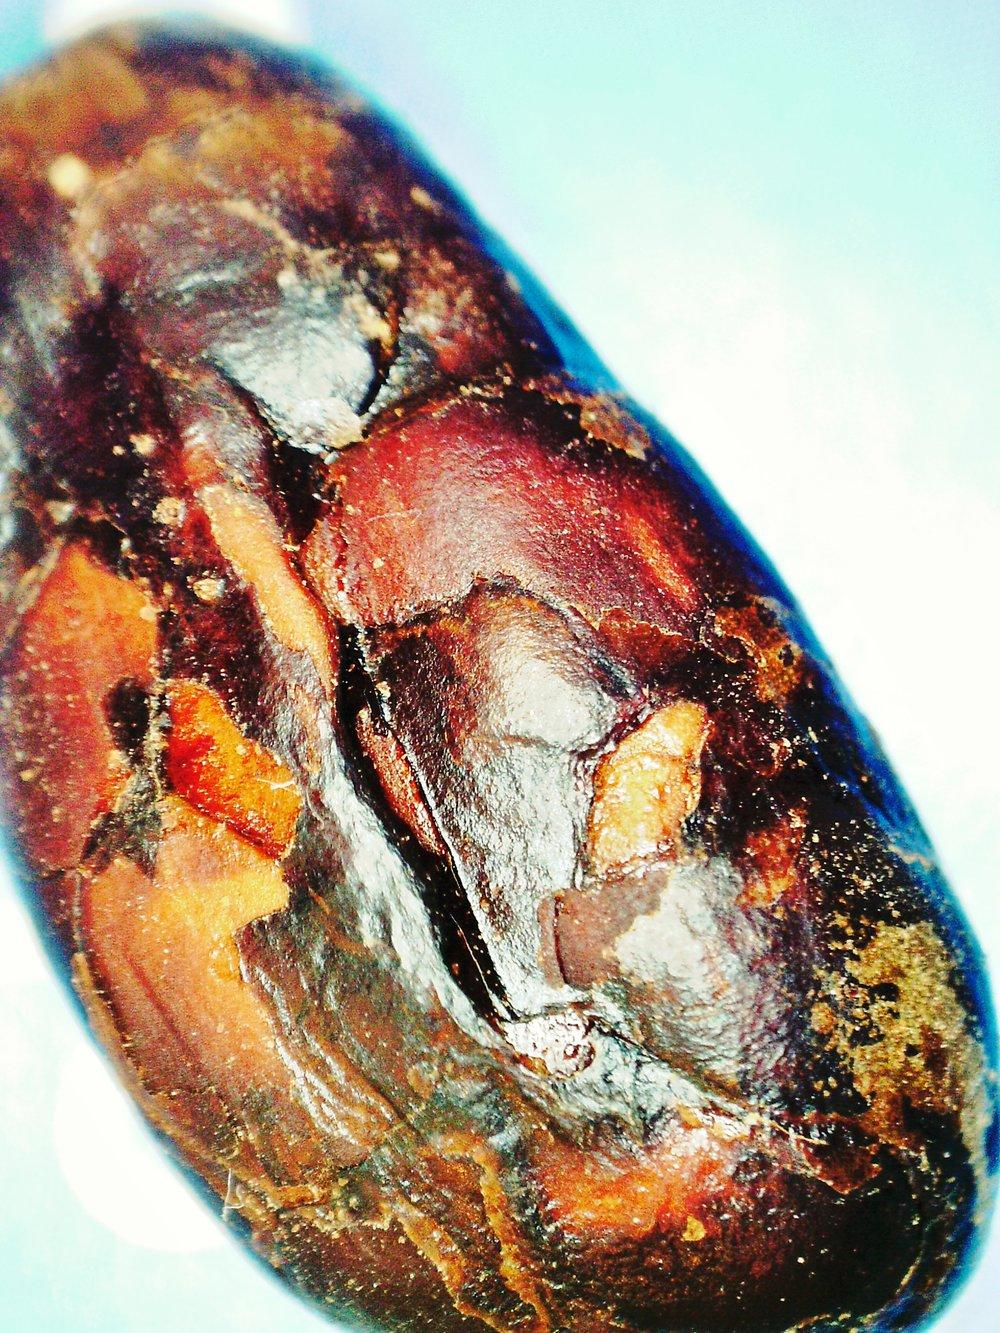 Nacional Cacao Bean: Under electron microscope.© 2015 Geoseph.com